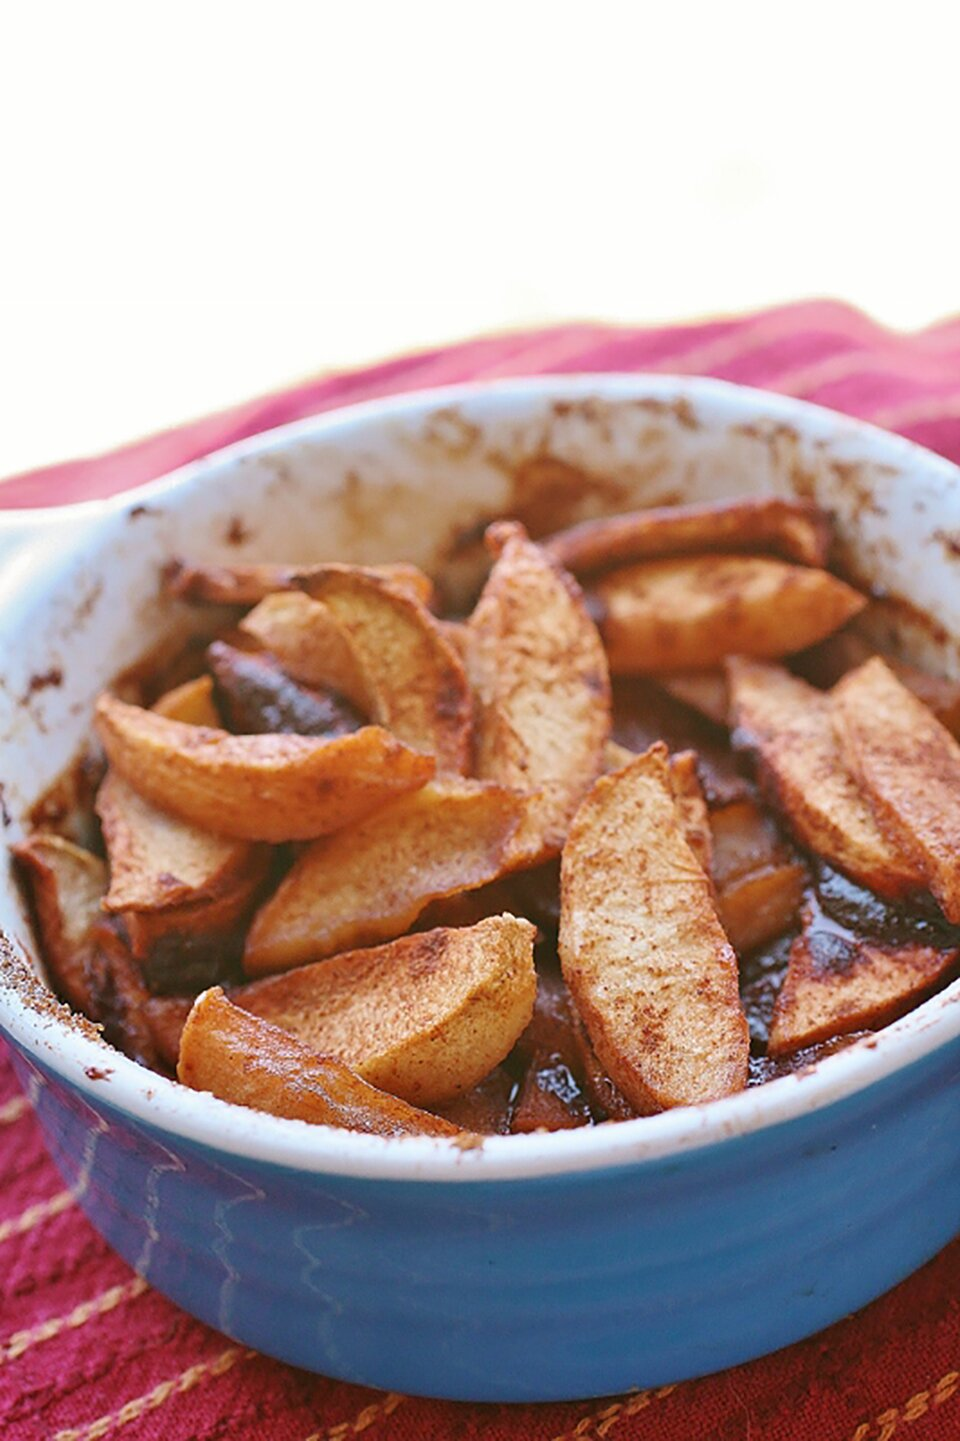 delicious cinnamon baked apples recipe